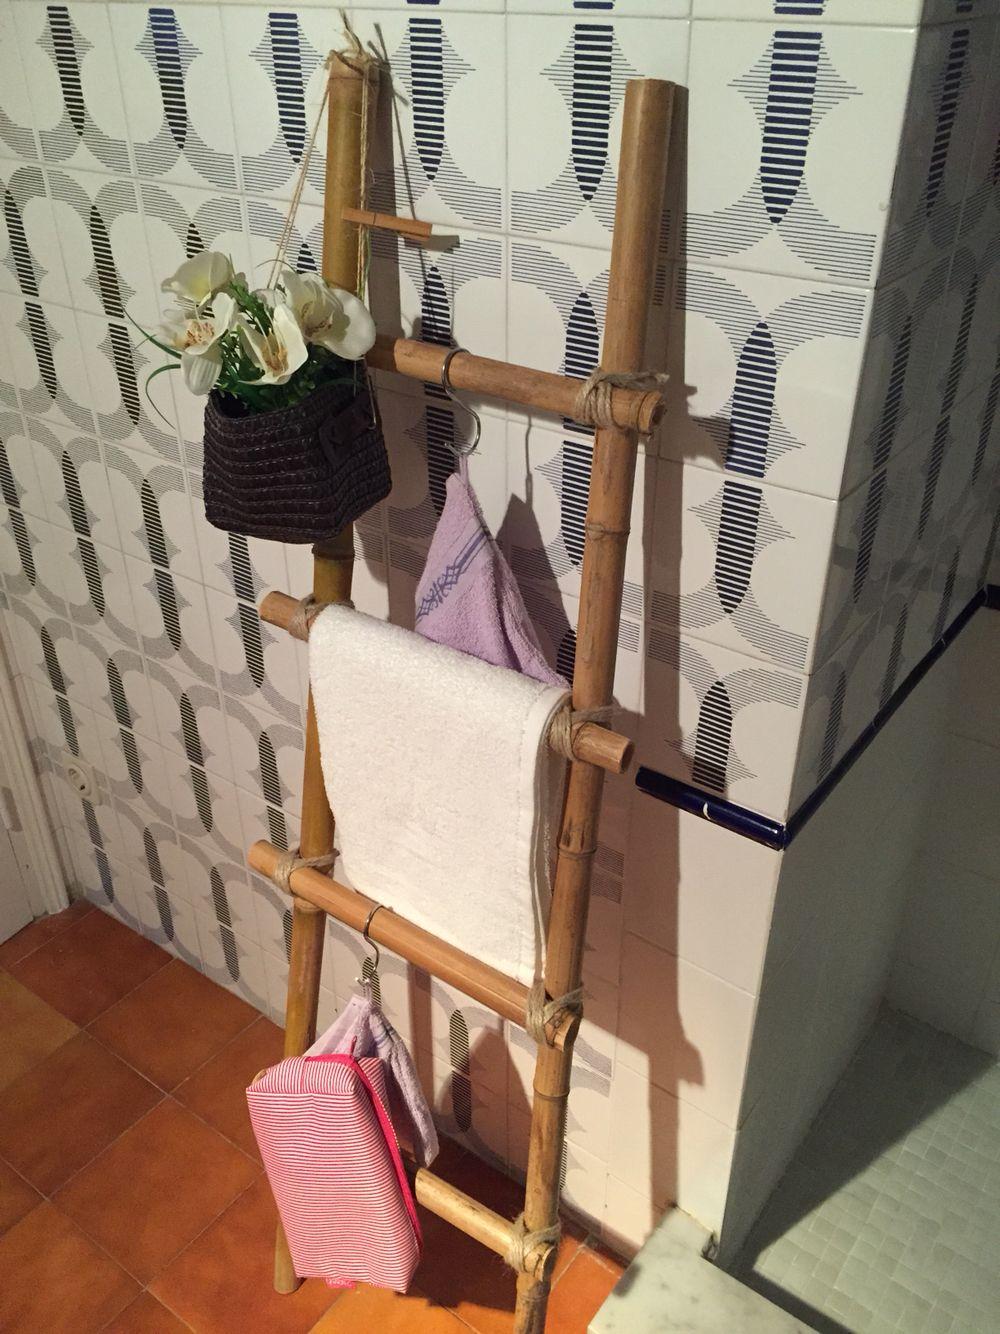 Escalera Ca De Bamb. Bamboo Ladder Eaglecrest Home